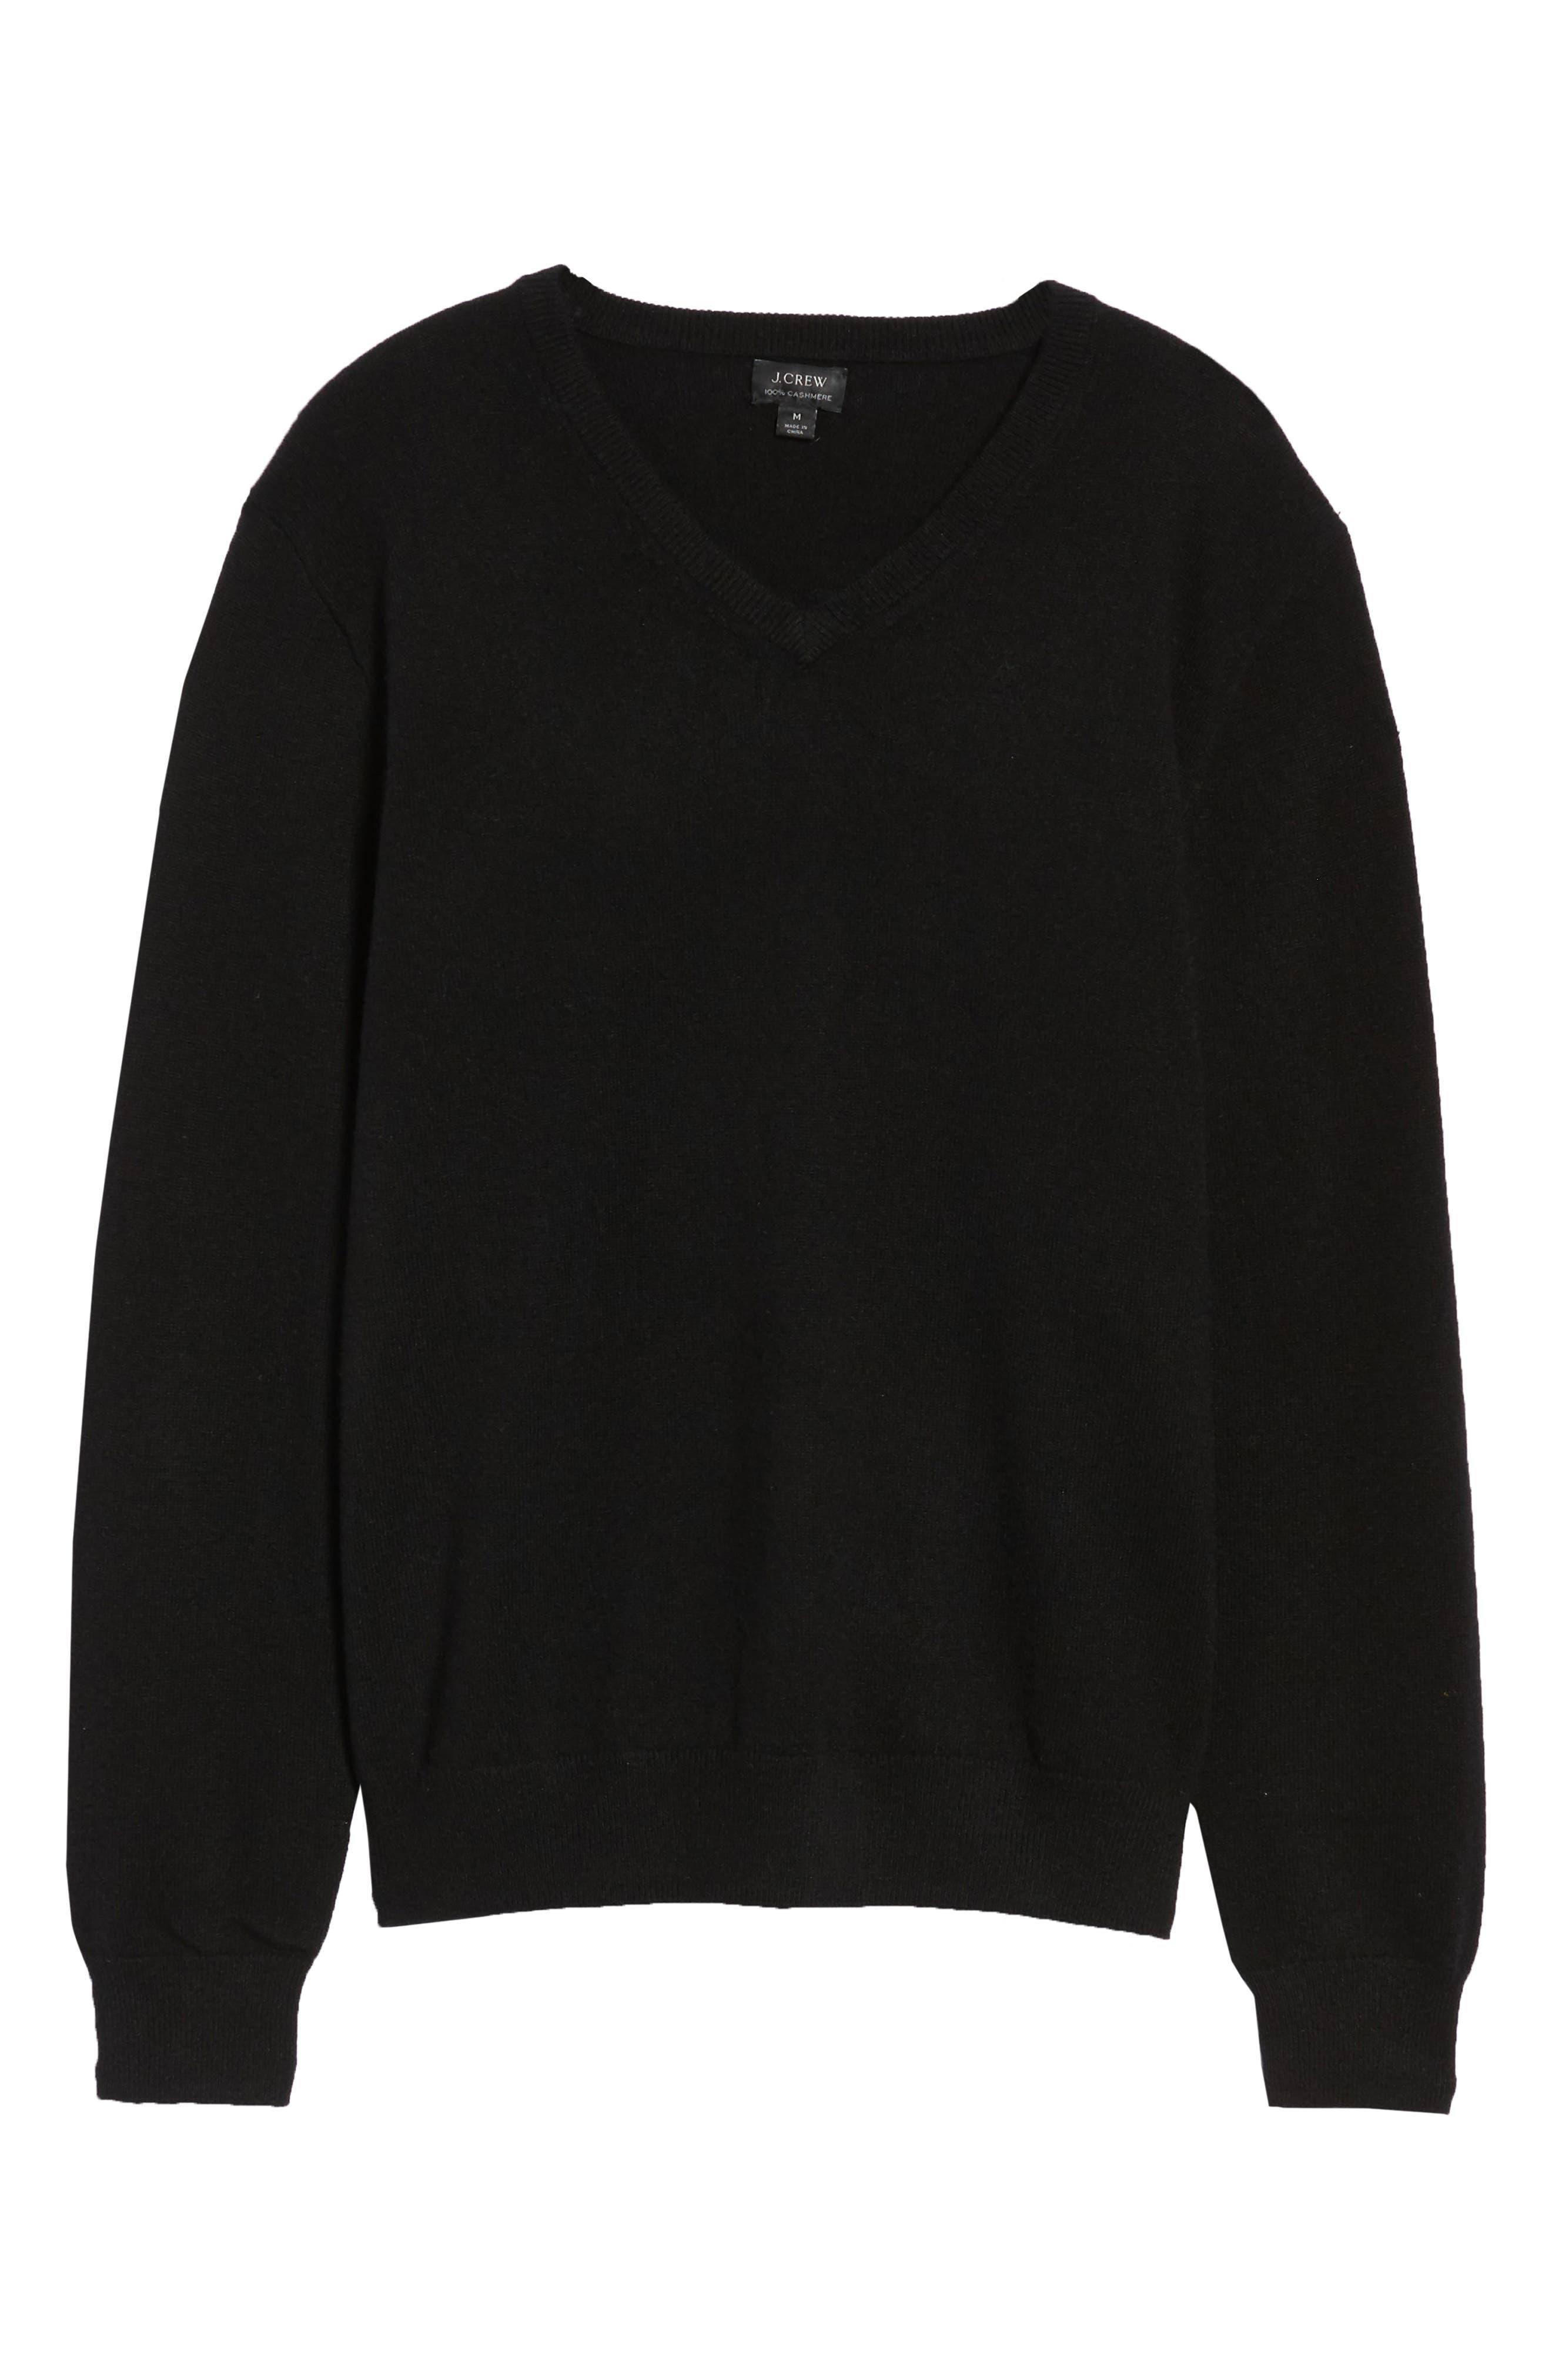 J.CREW,                             Everyday Cashmere Regular Fit V-Neck Sweater,                             Alternate thumbnail 6, color,                             001